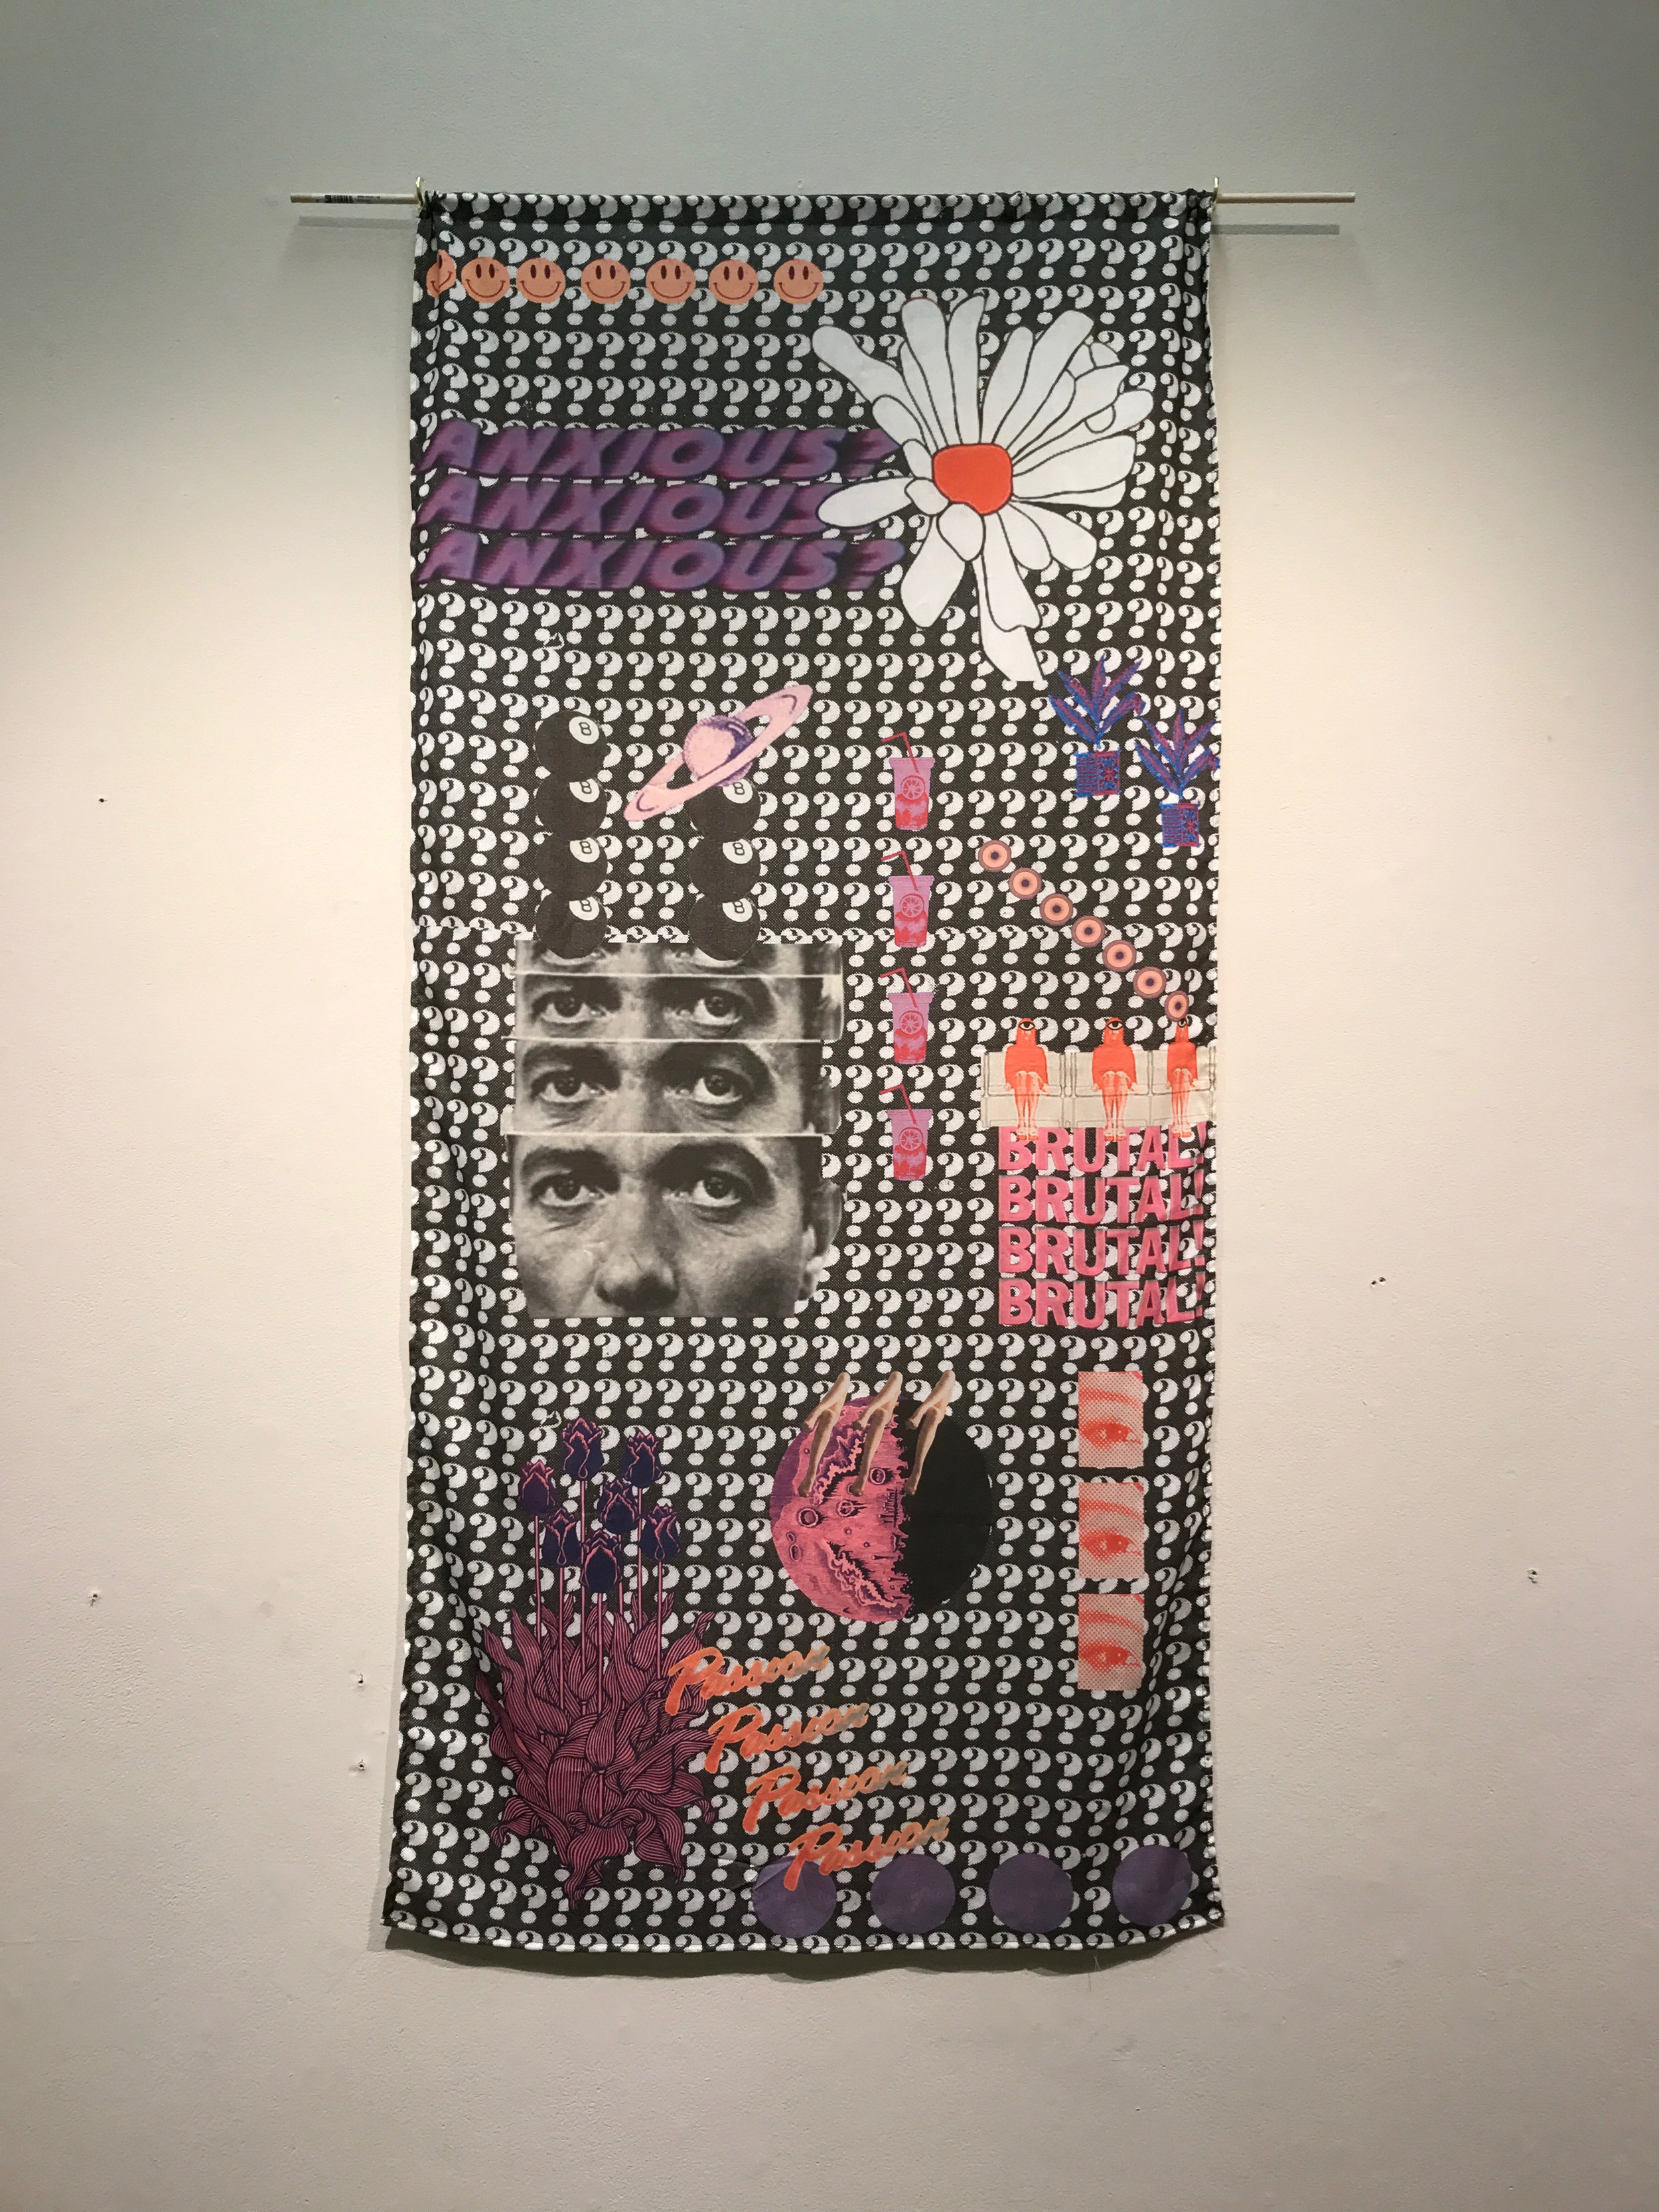 fabricprint.jpg